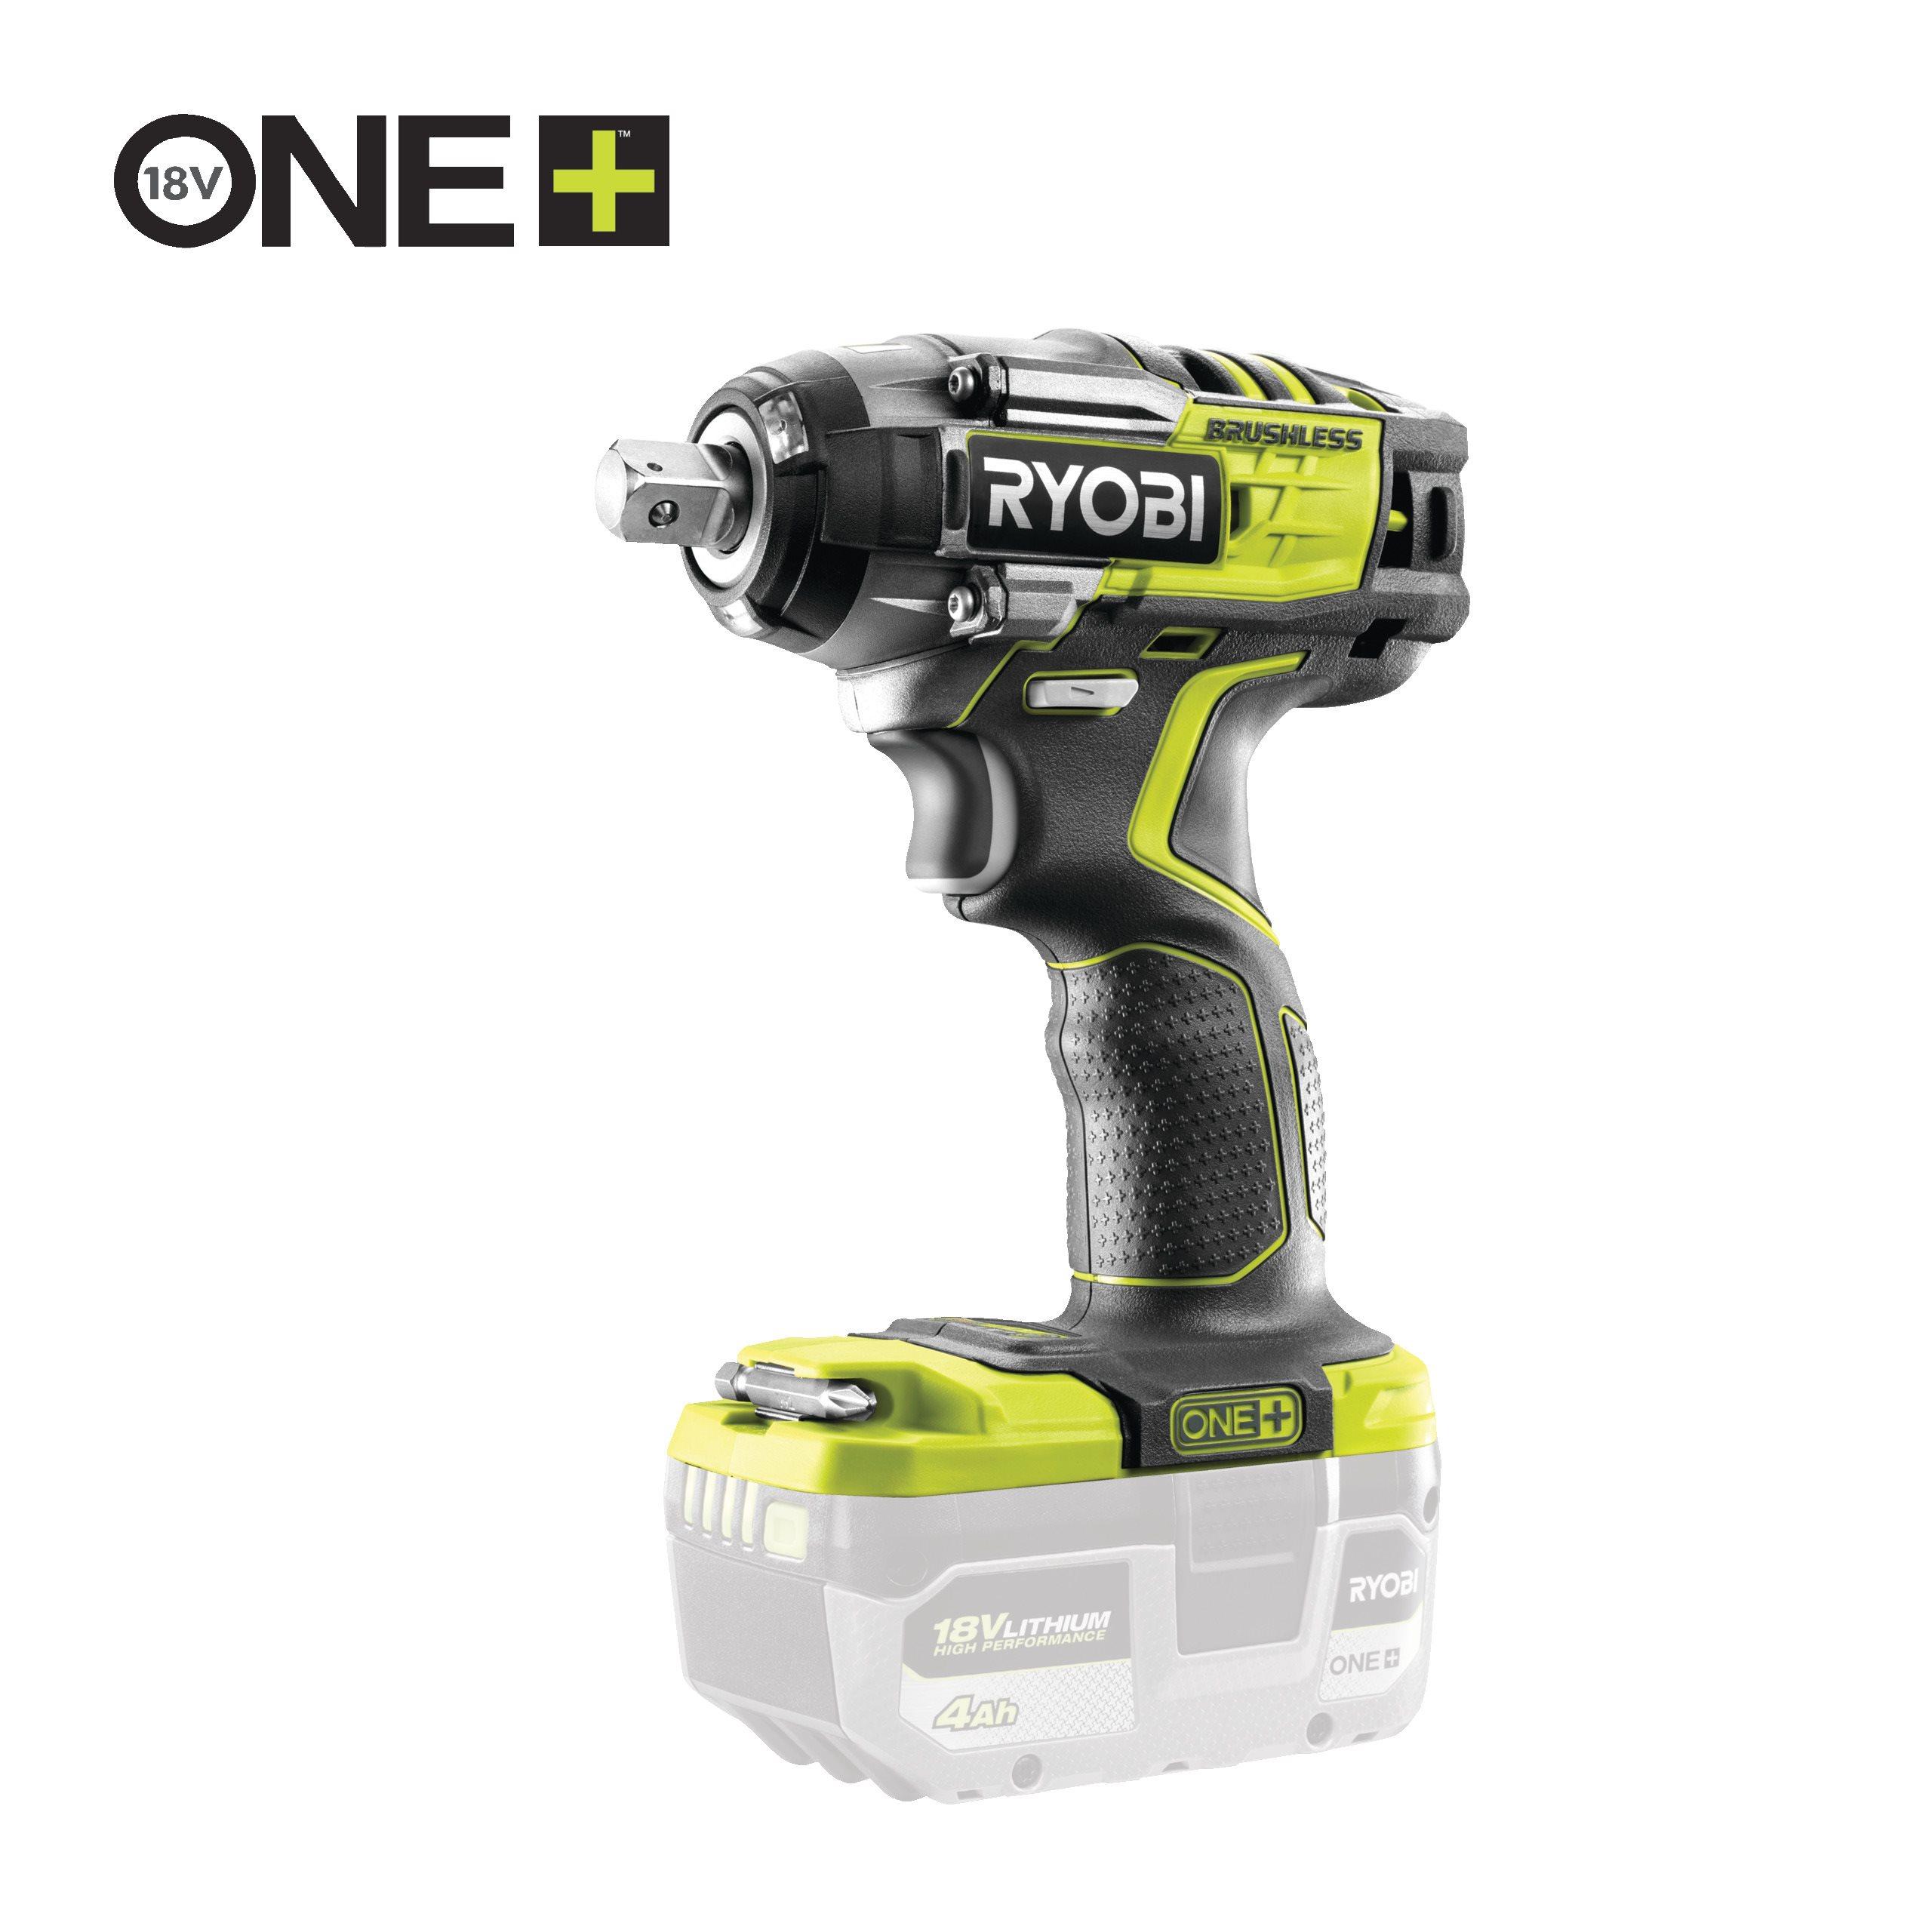 18V ONE+™ Cordless Brushless 3-Speed Impact Wrench (Bare Tool)